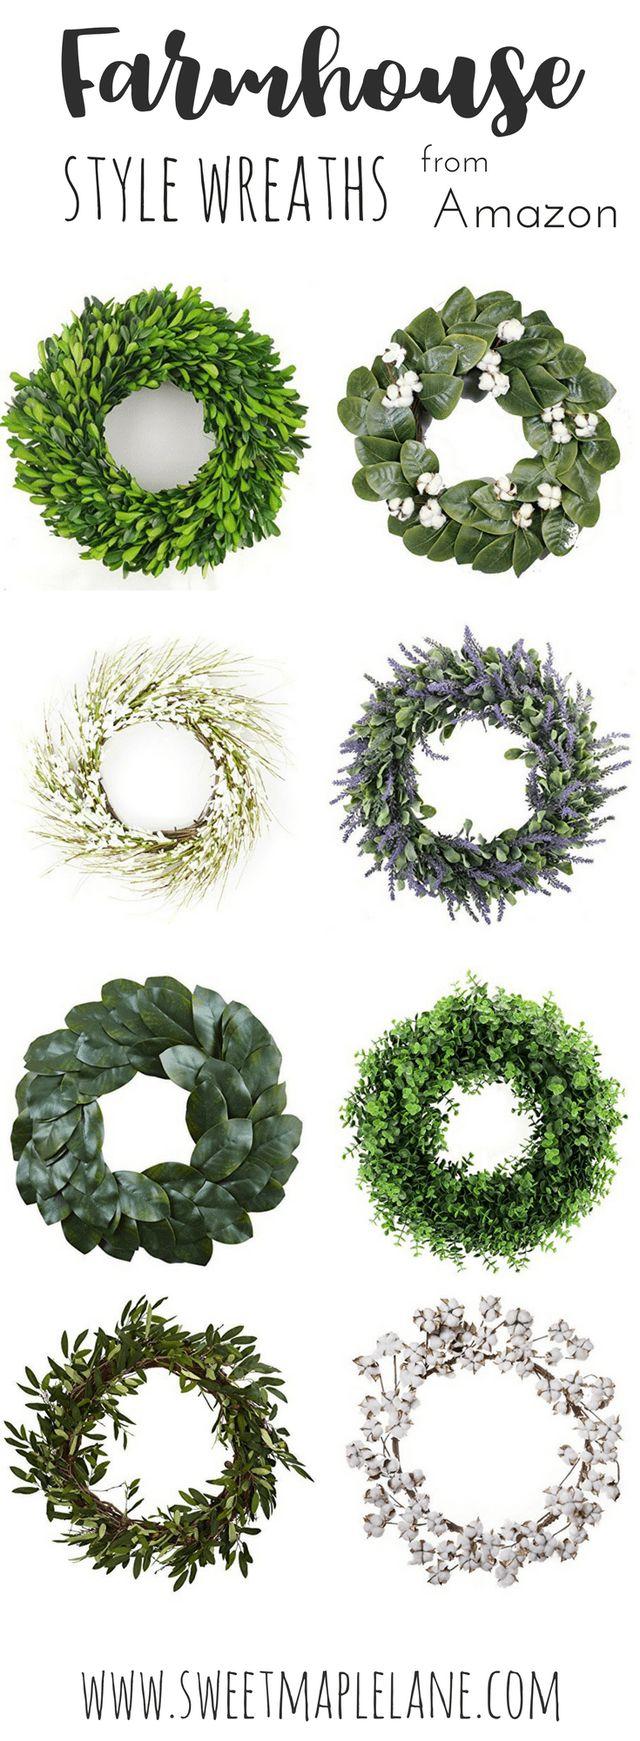 Farmhouse Style Wreaths from Amazon